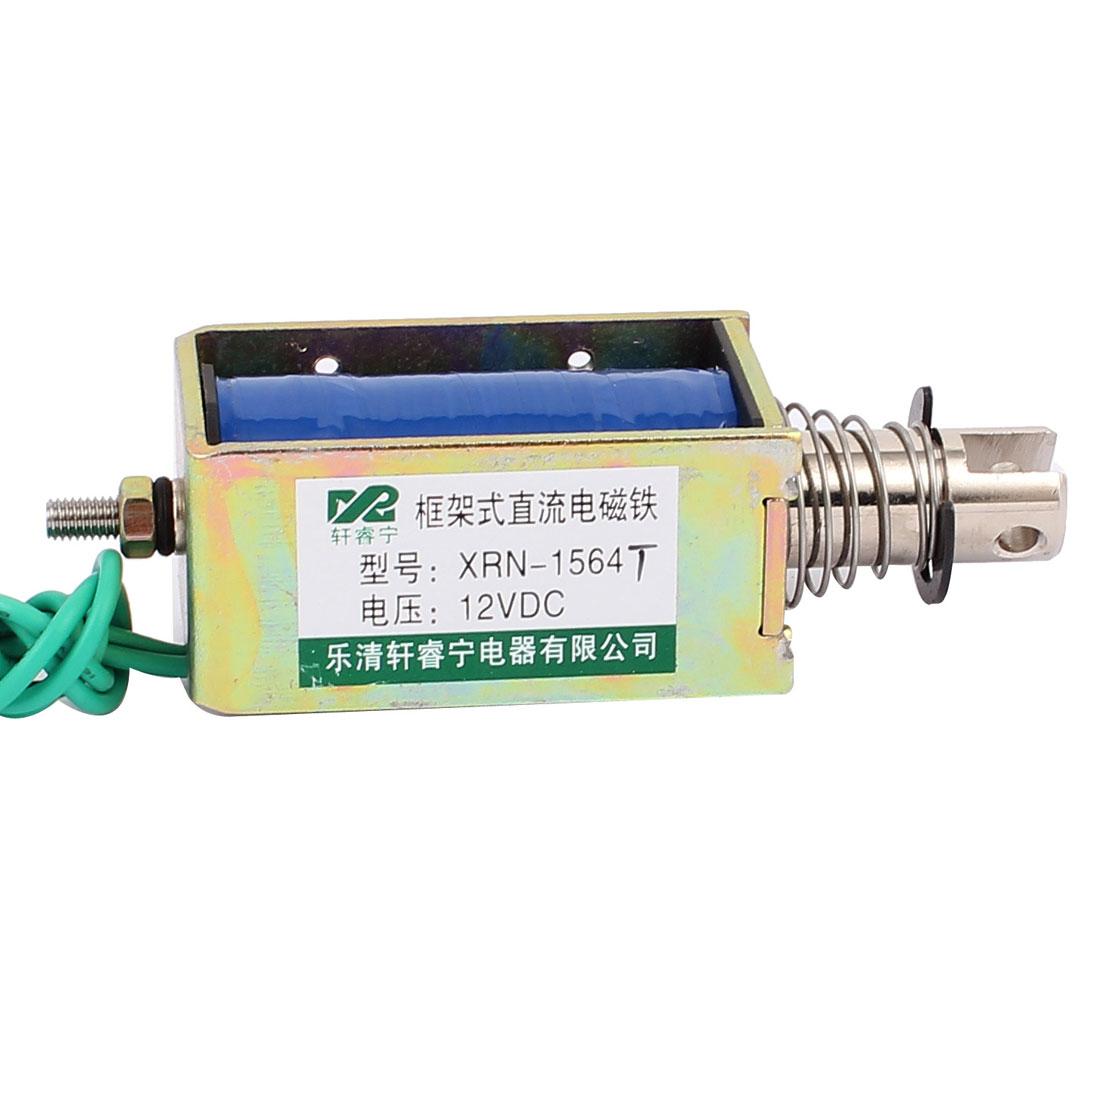 XRN-1564T 10mm 55N Spring Load Push Pull Actuator Electromagnet Solenoid DC 12V - image 2 of 3